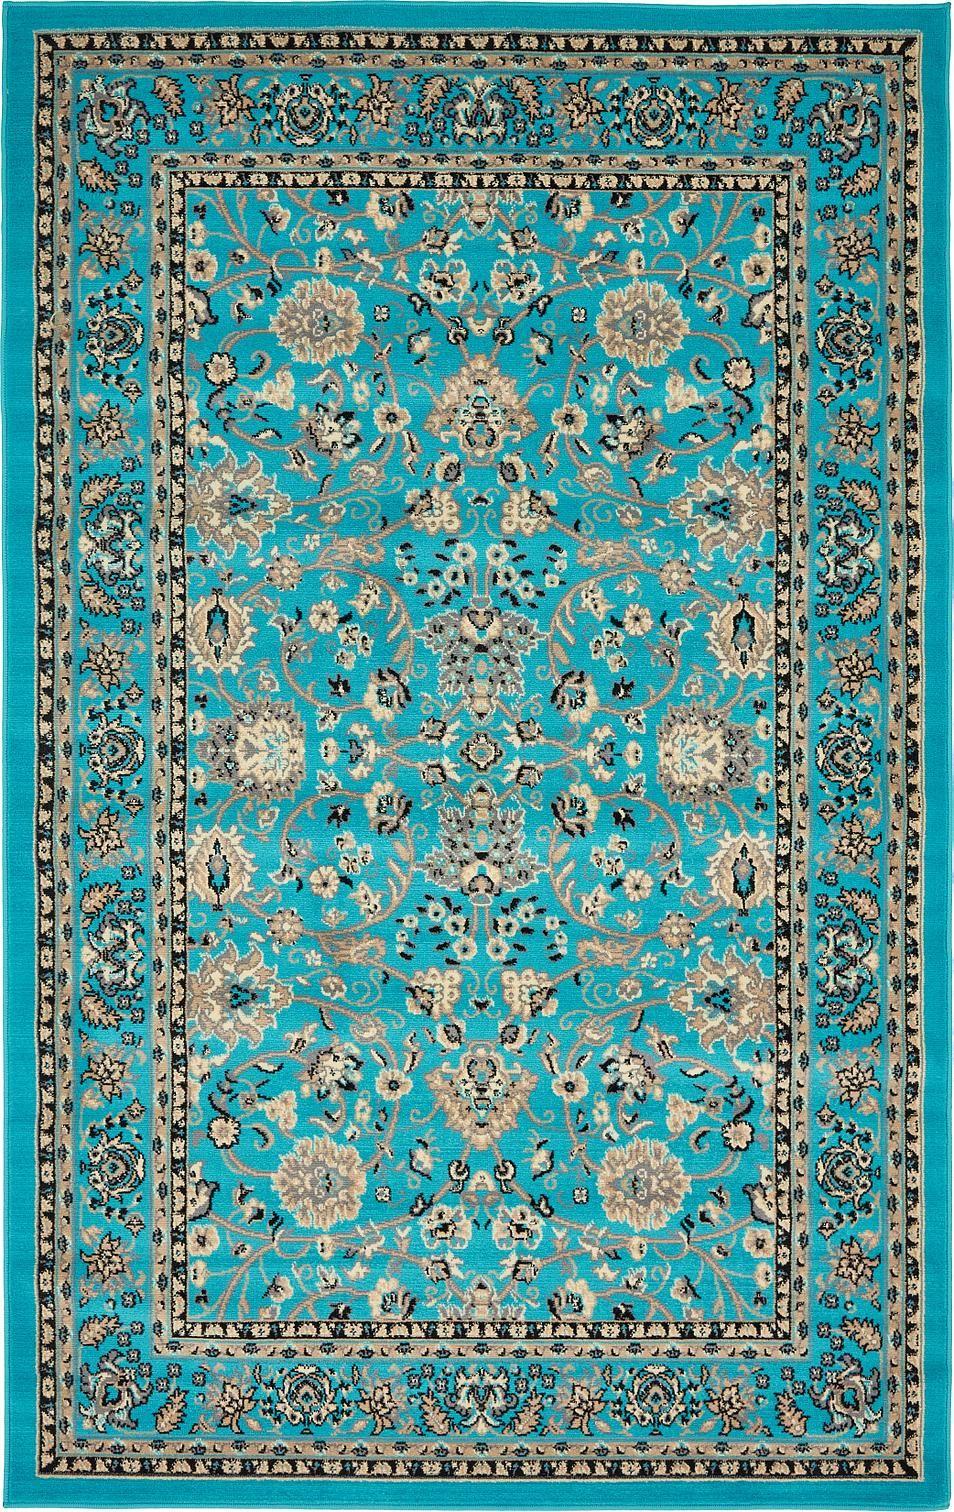 Turquoise 5 39 X 8 39 Kashan Design Rug Area Rugs